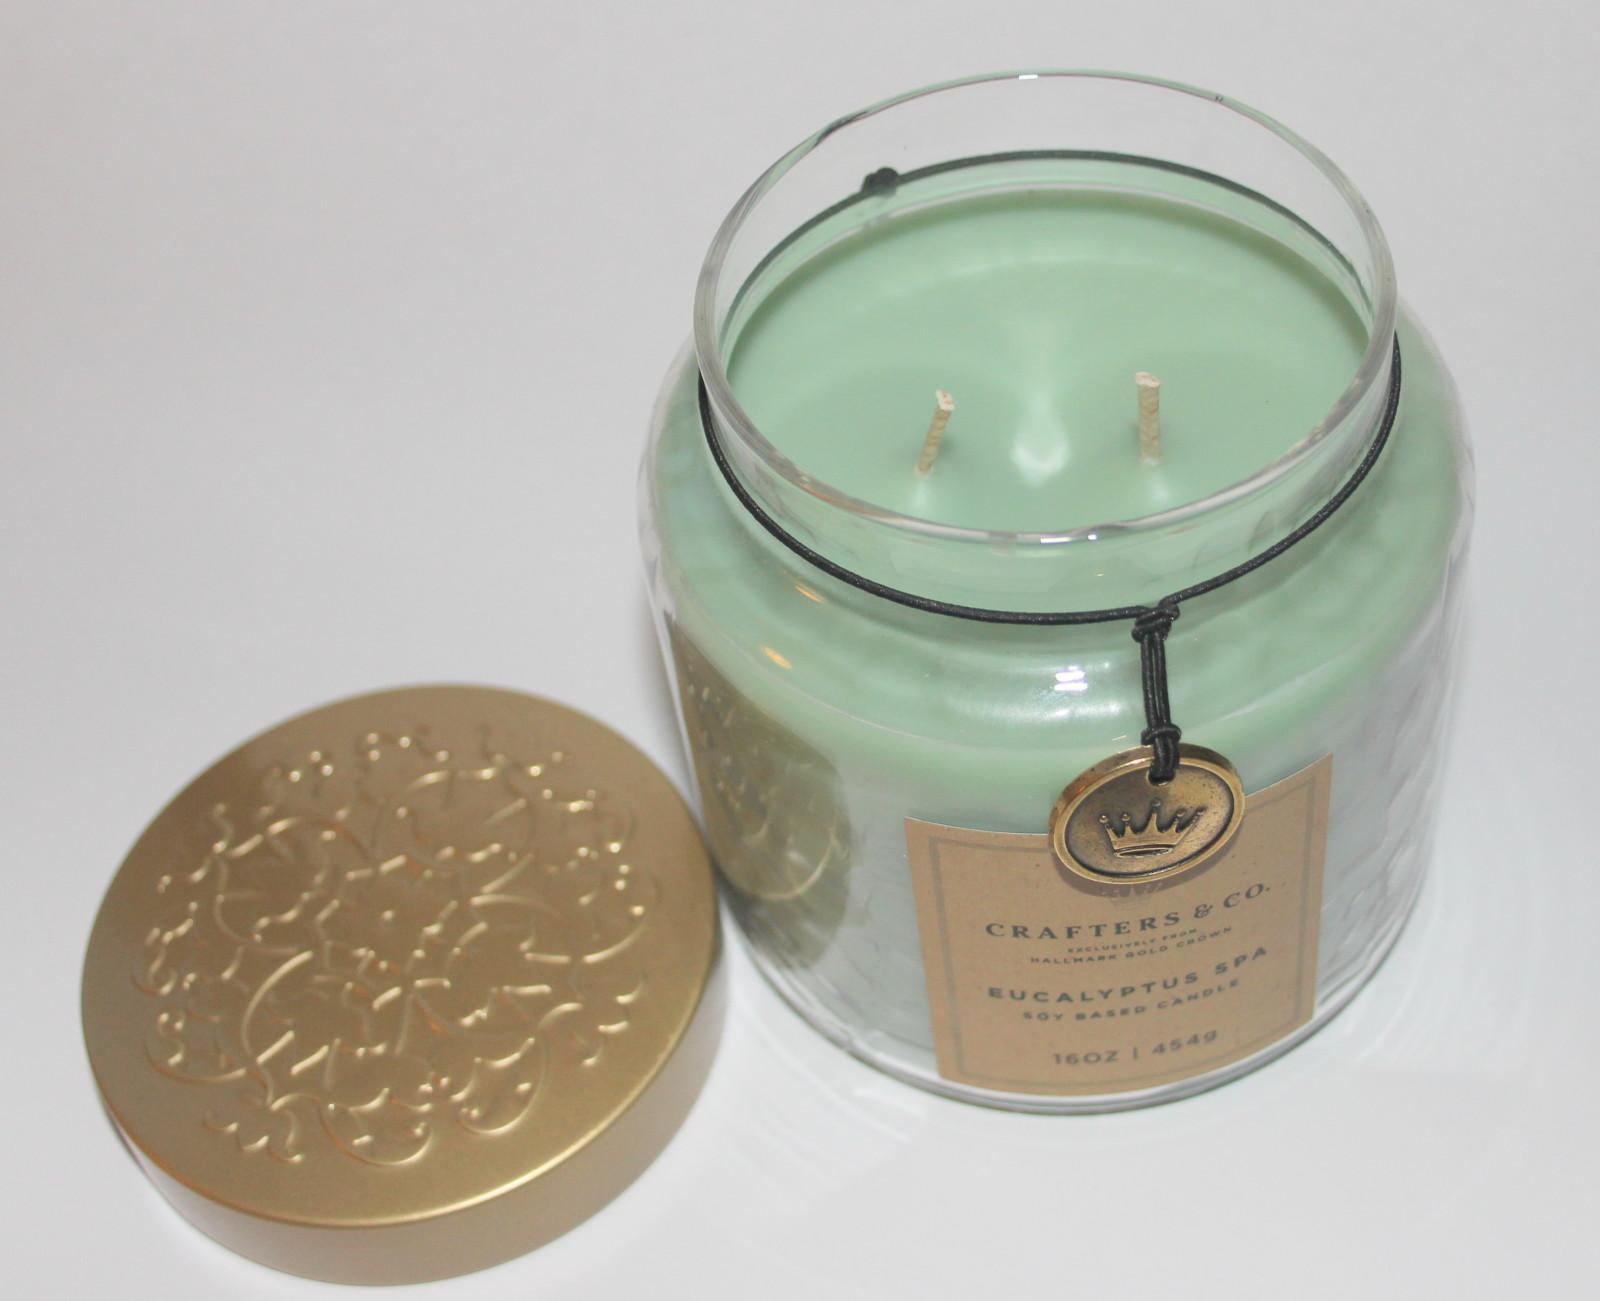 Eucalyptus Spa Soy Candle Hallmark